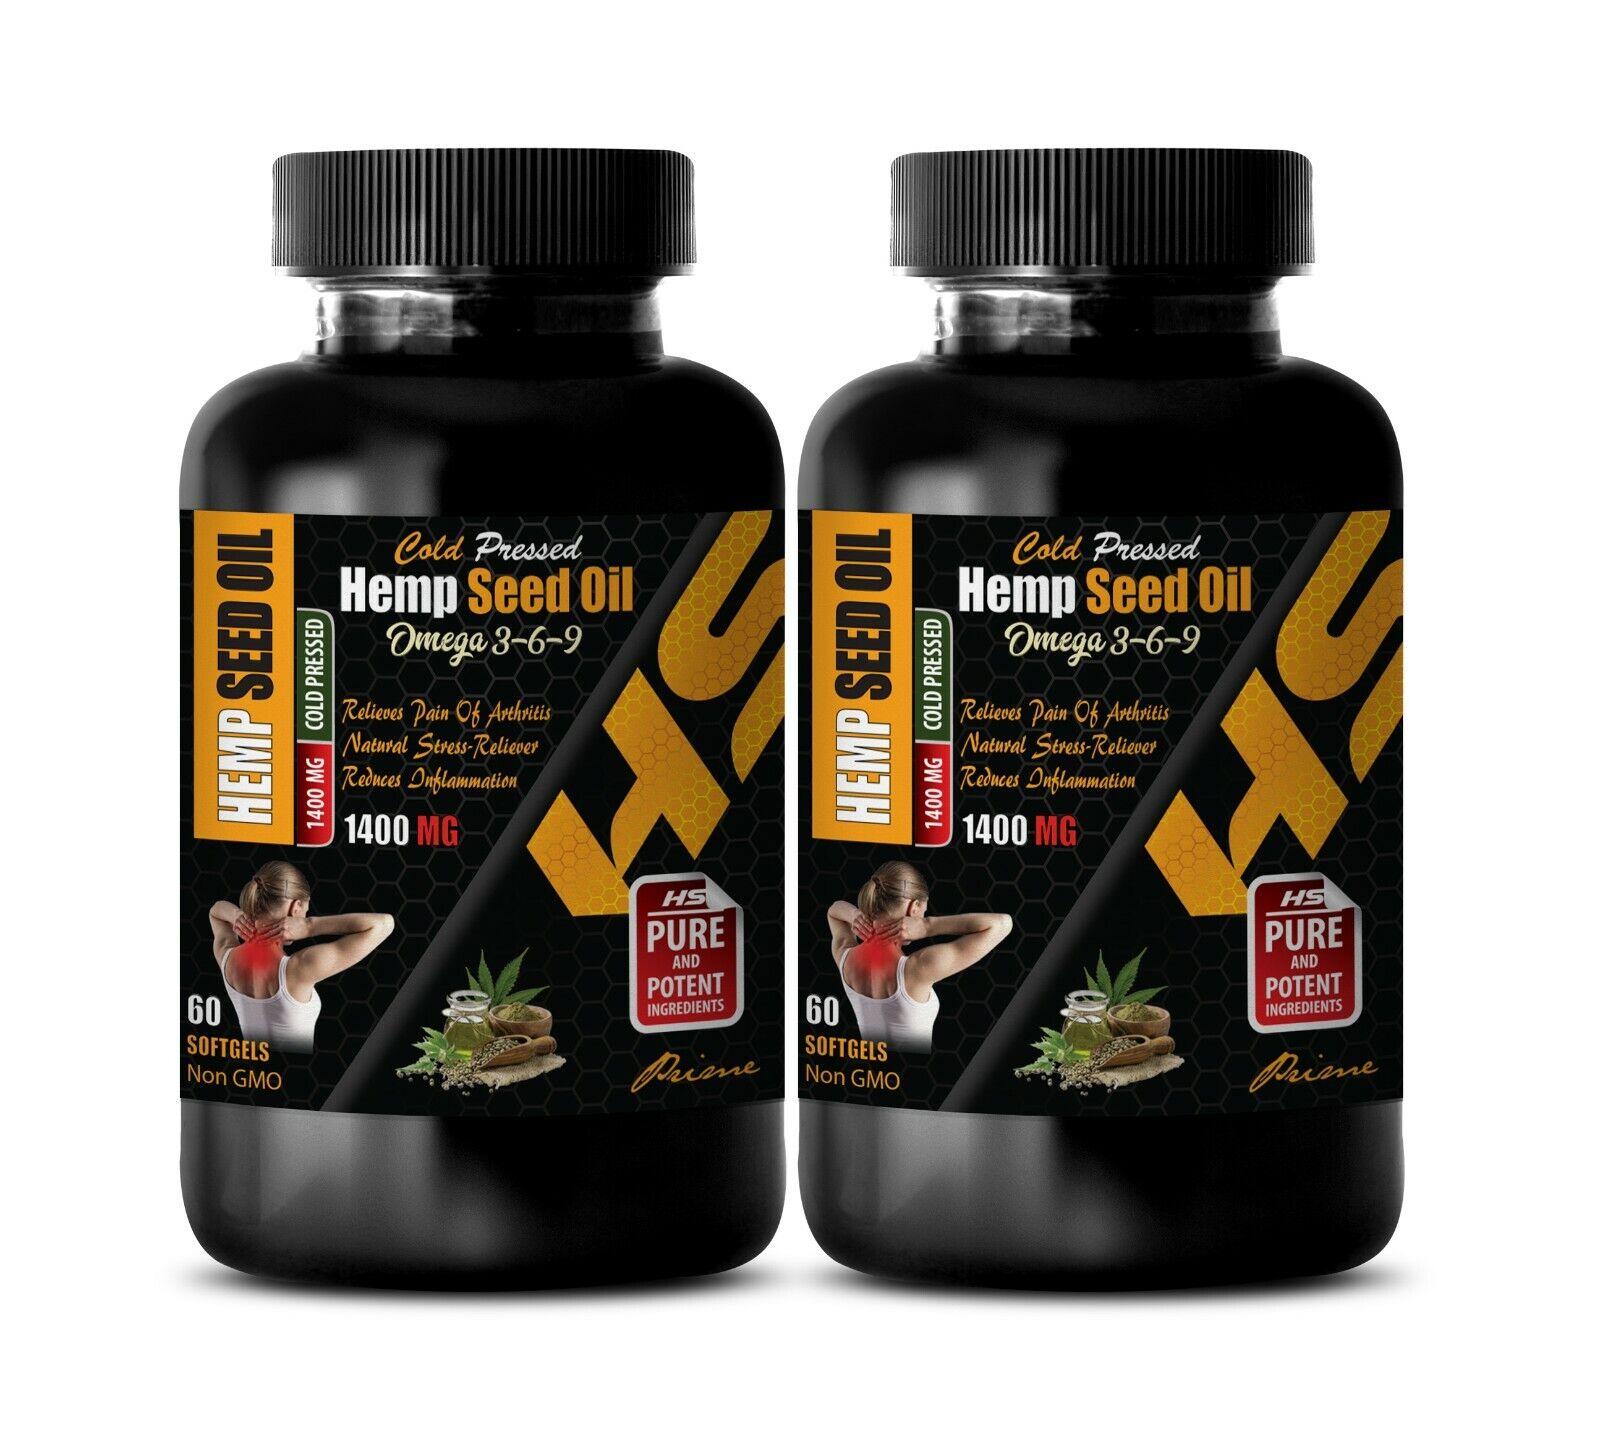 pure hemp oil - ORGANIC HEMP SEED OIL 1400mg - pms supplement - 2 Bot 120 Caps